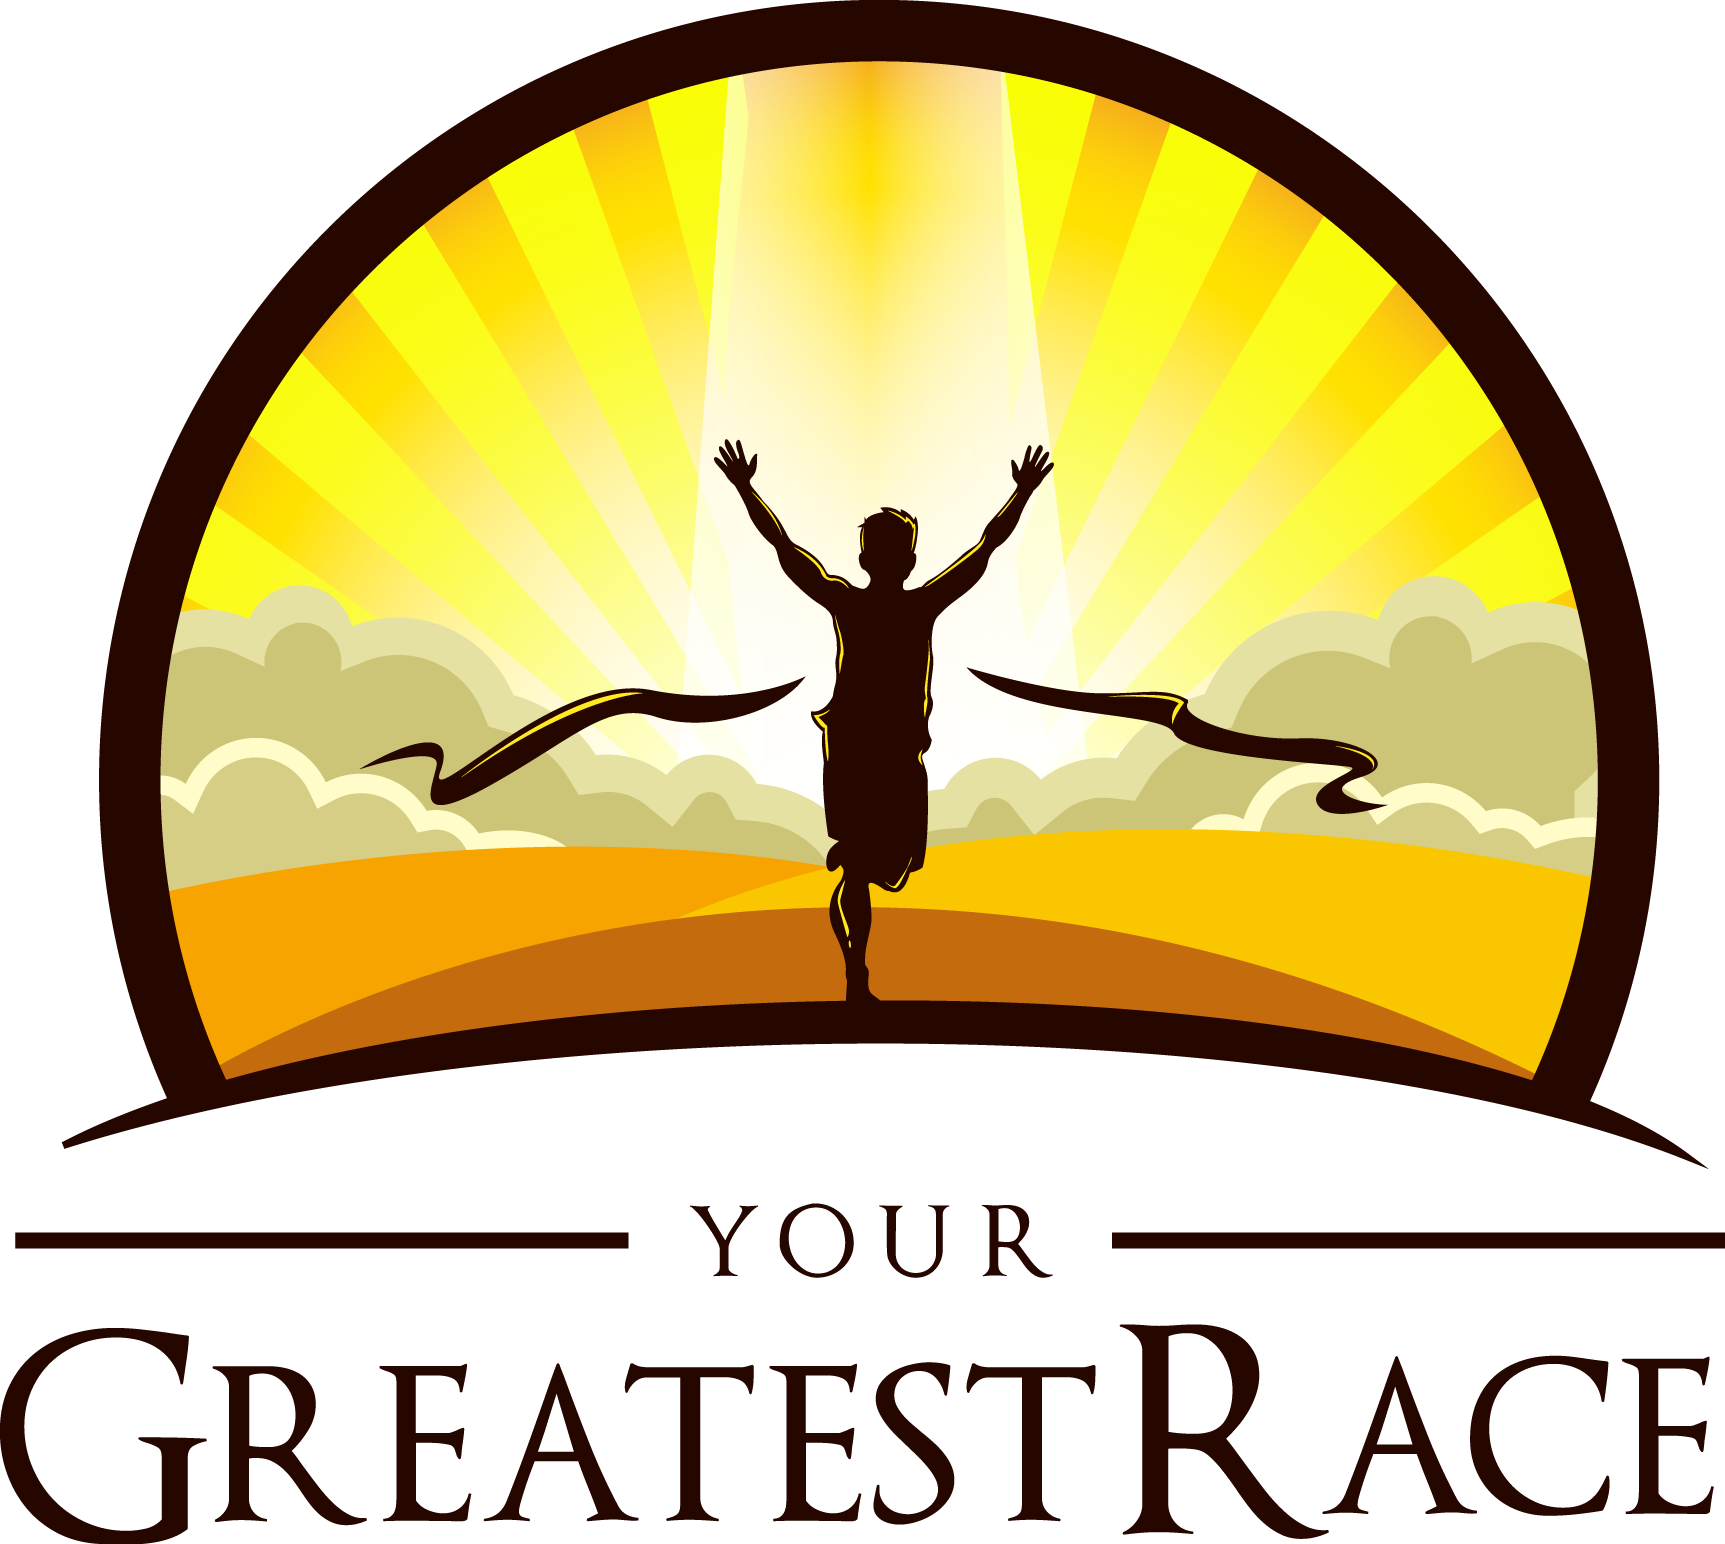 Your Greatest Race logo design